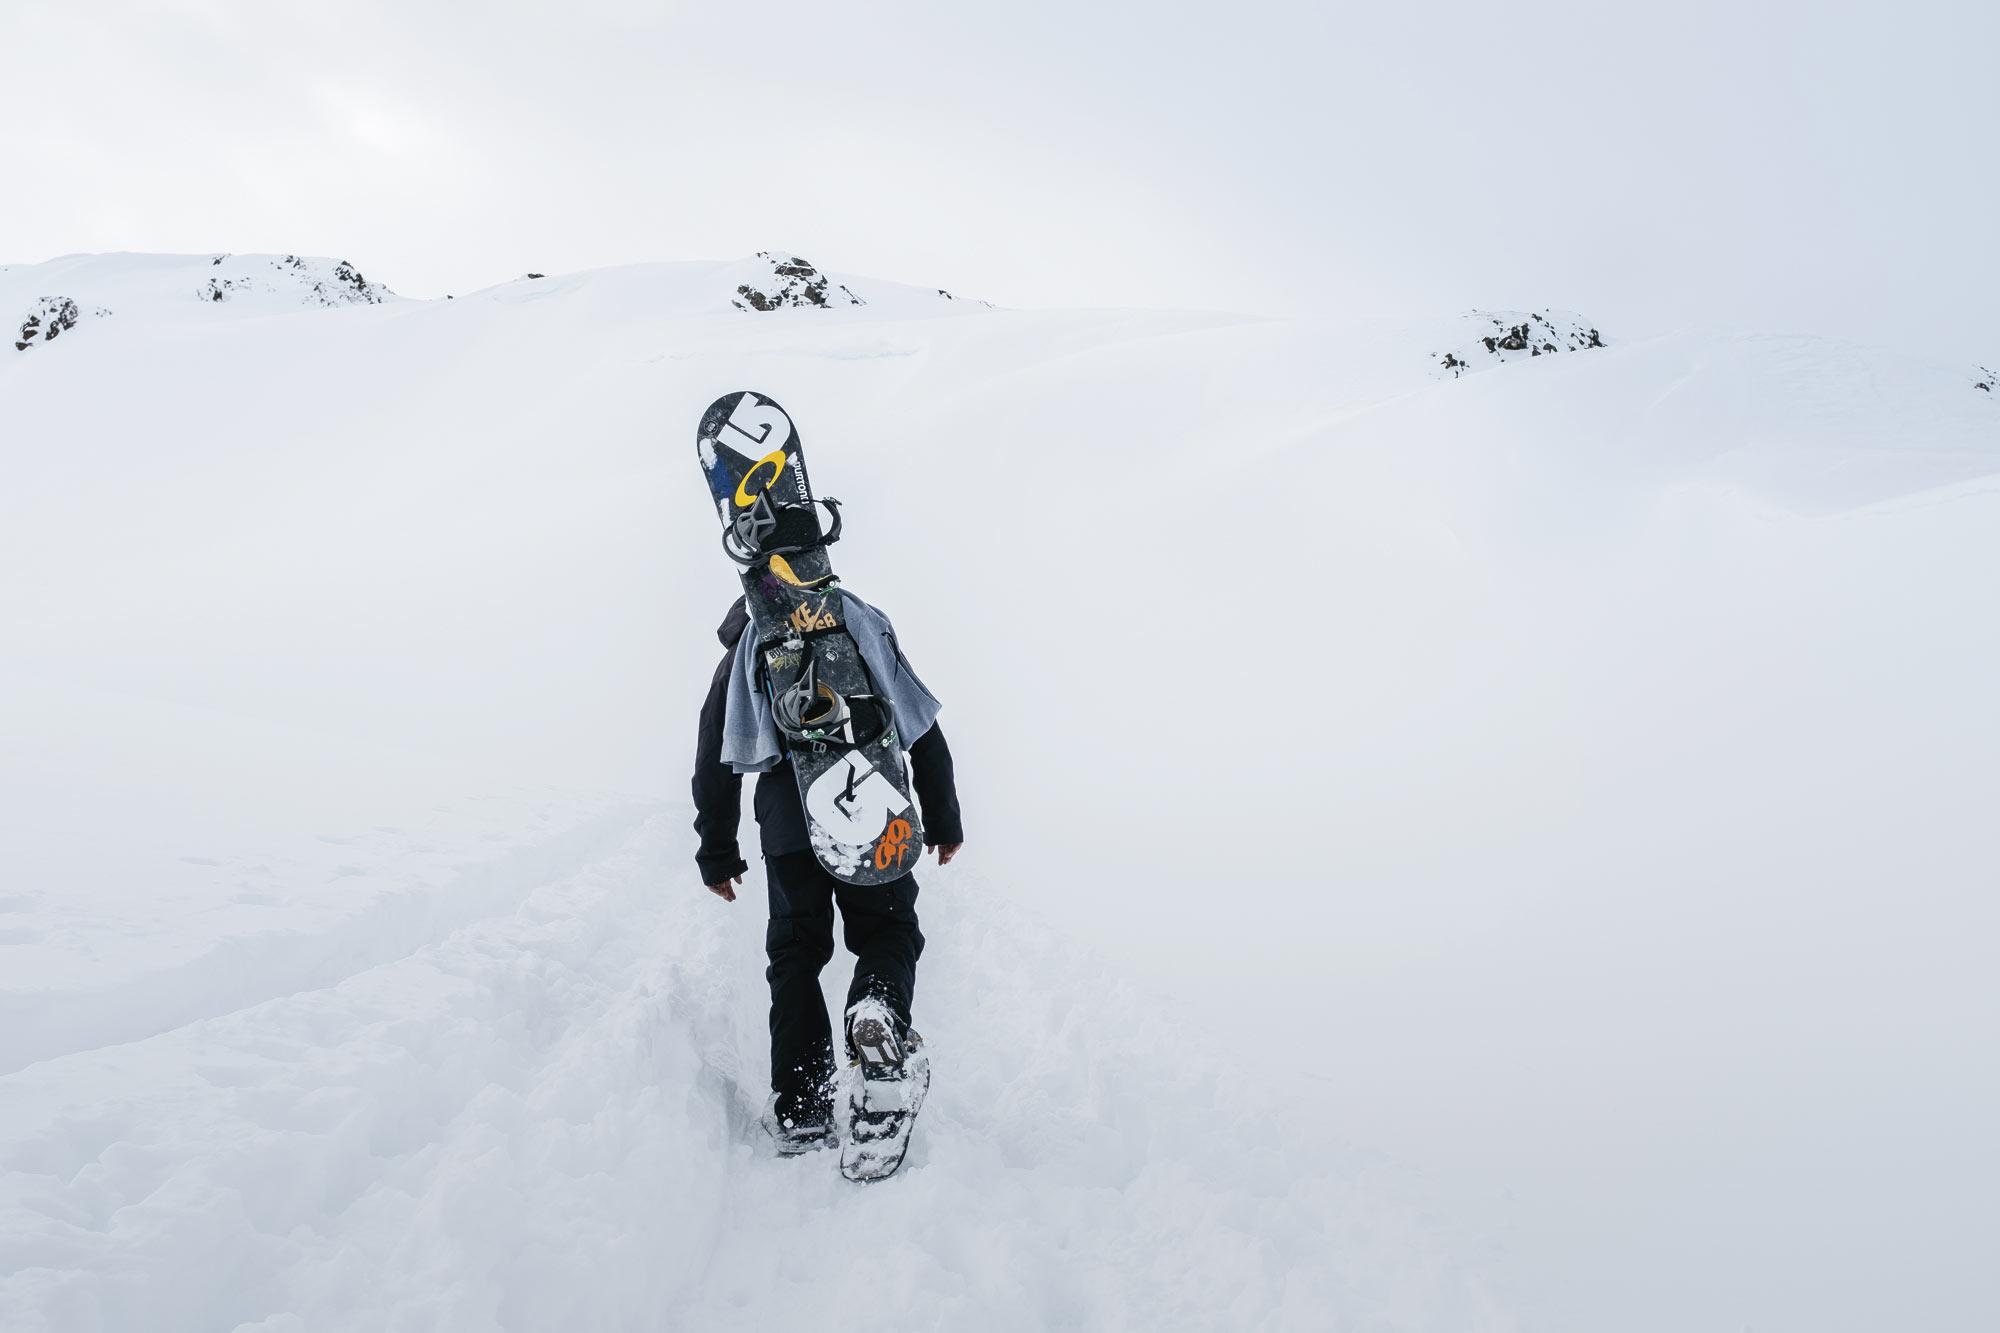 Sport, fotografie, reportage, dokumentation, alpen fotografie